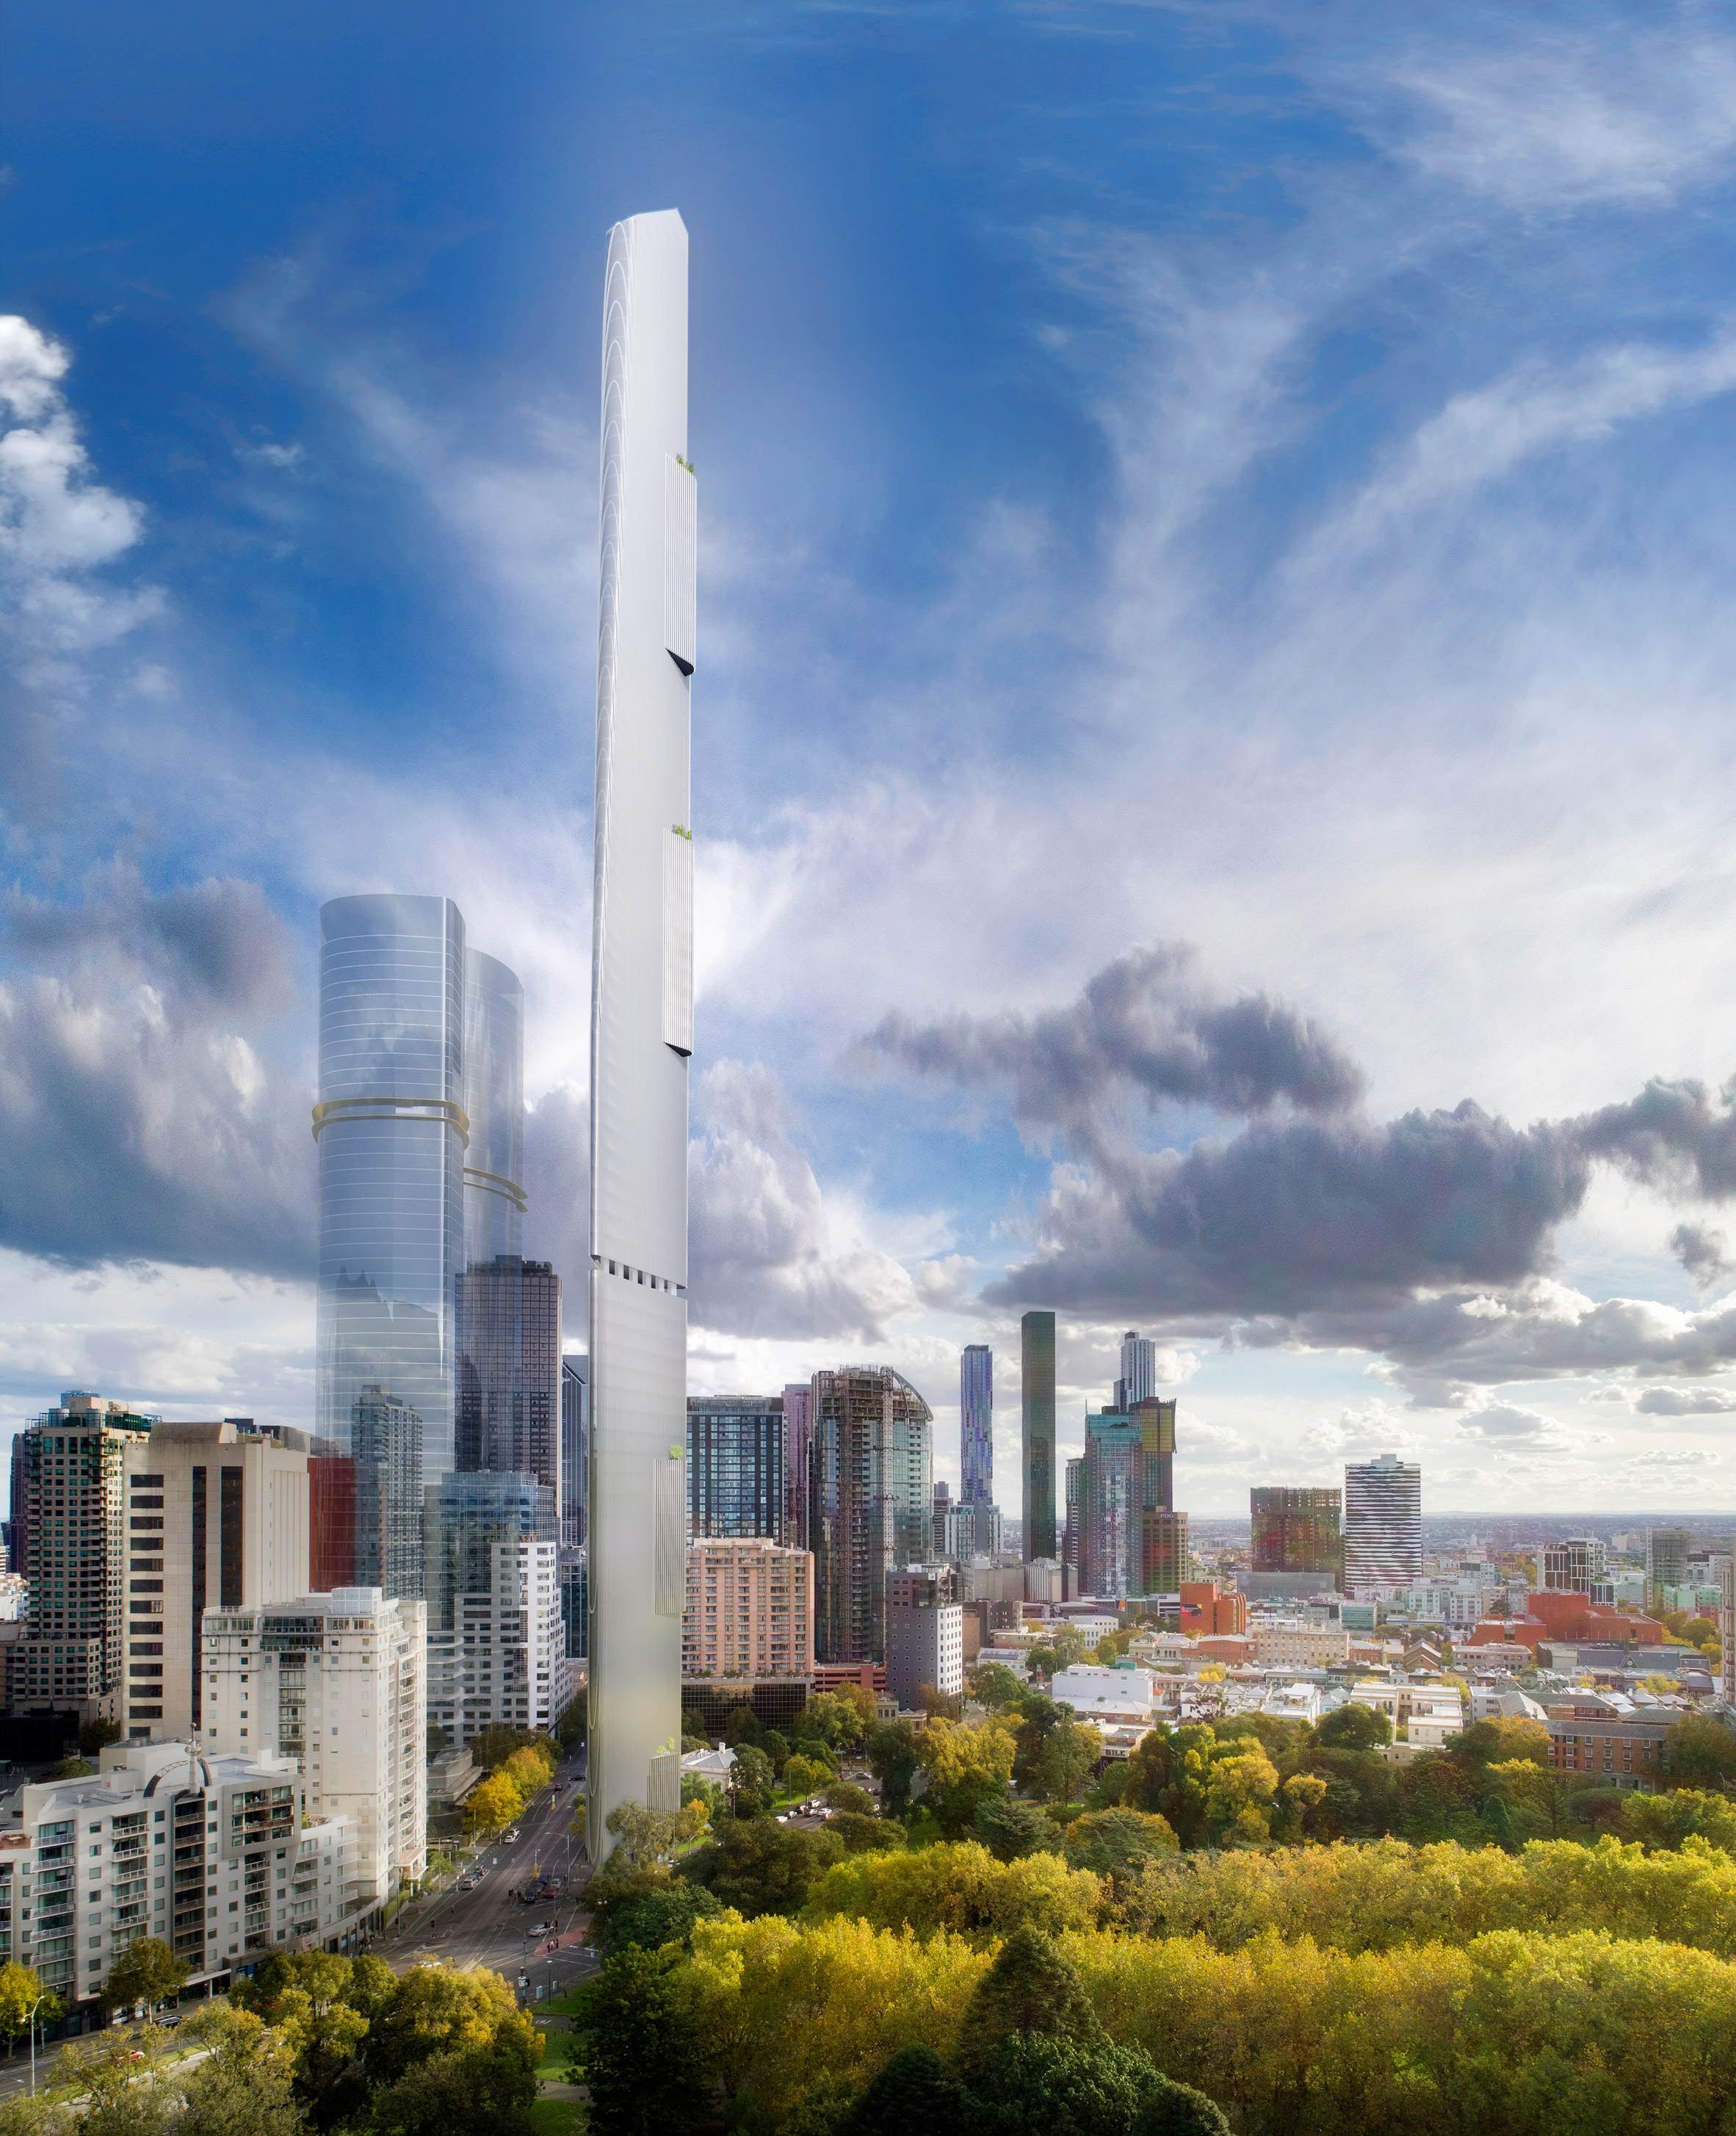 Australia's tallest building